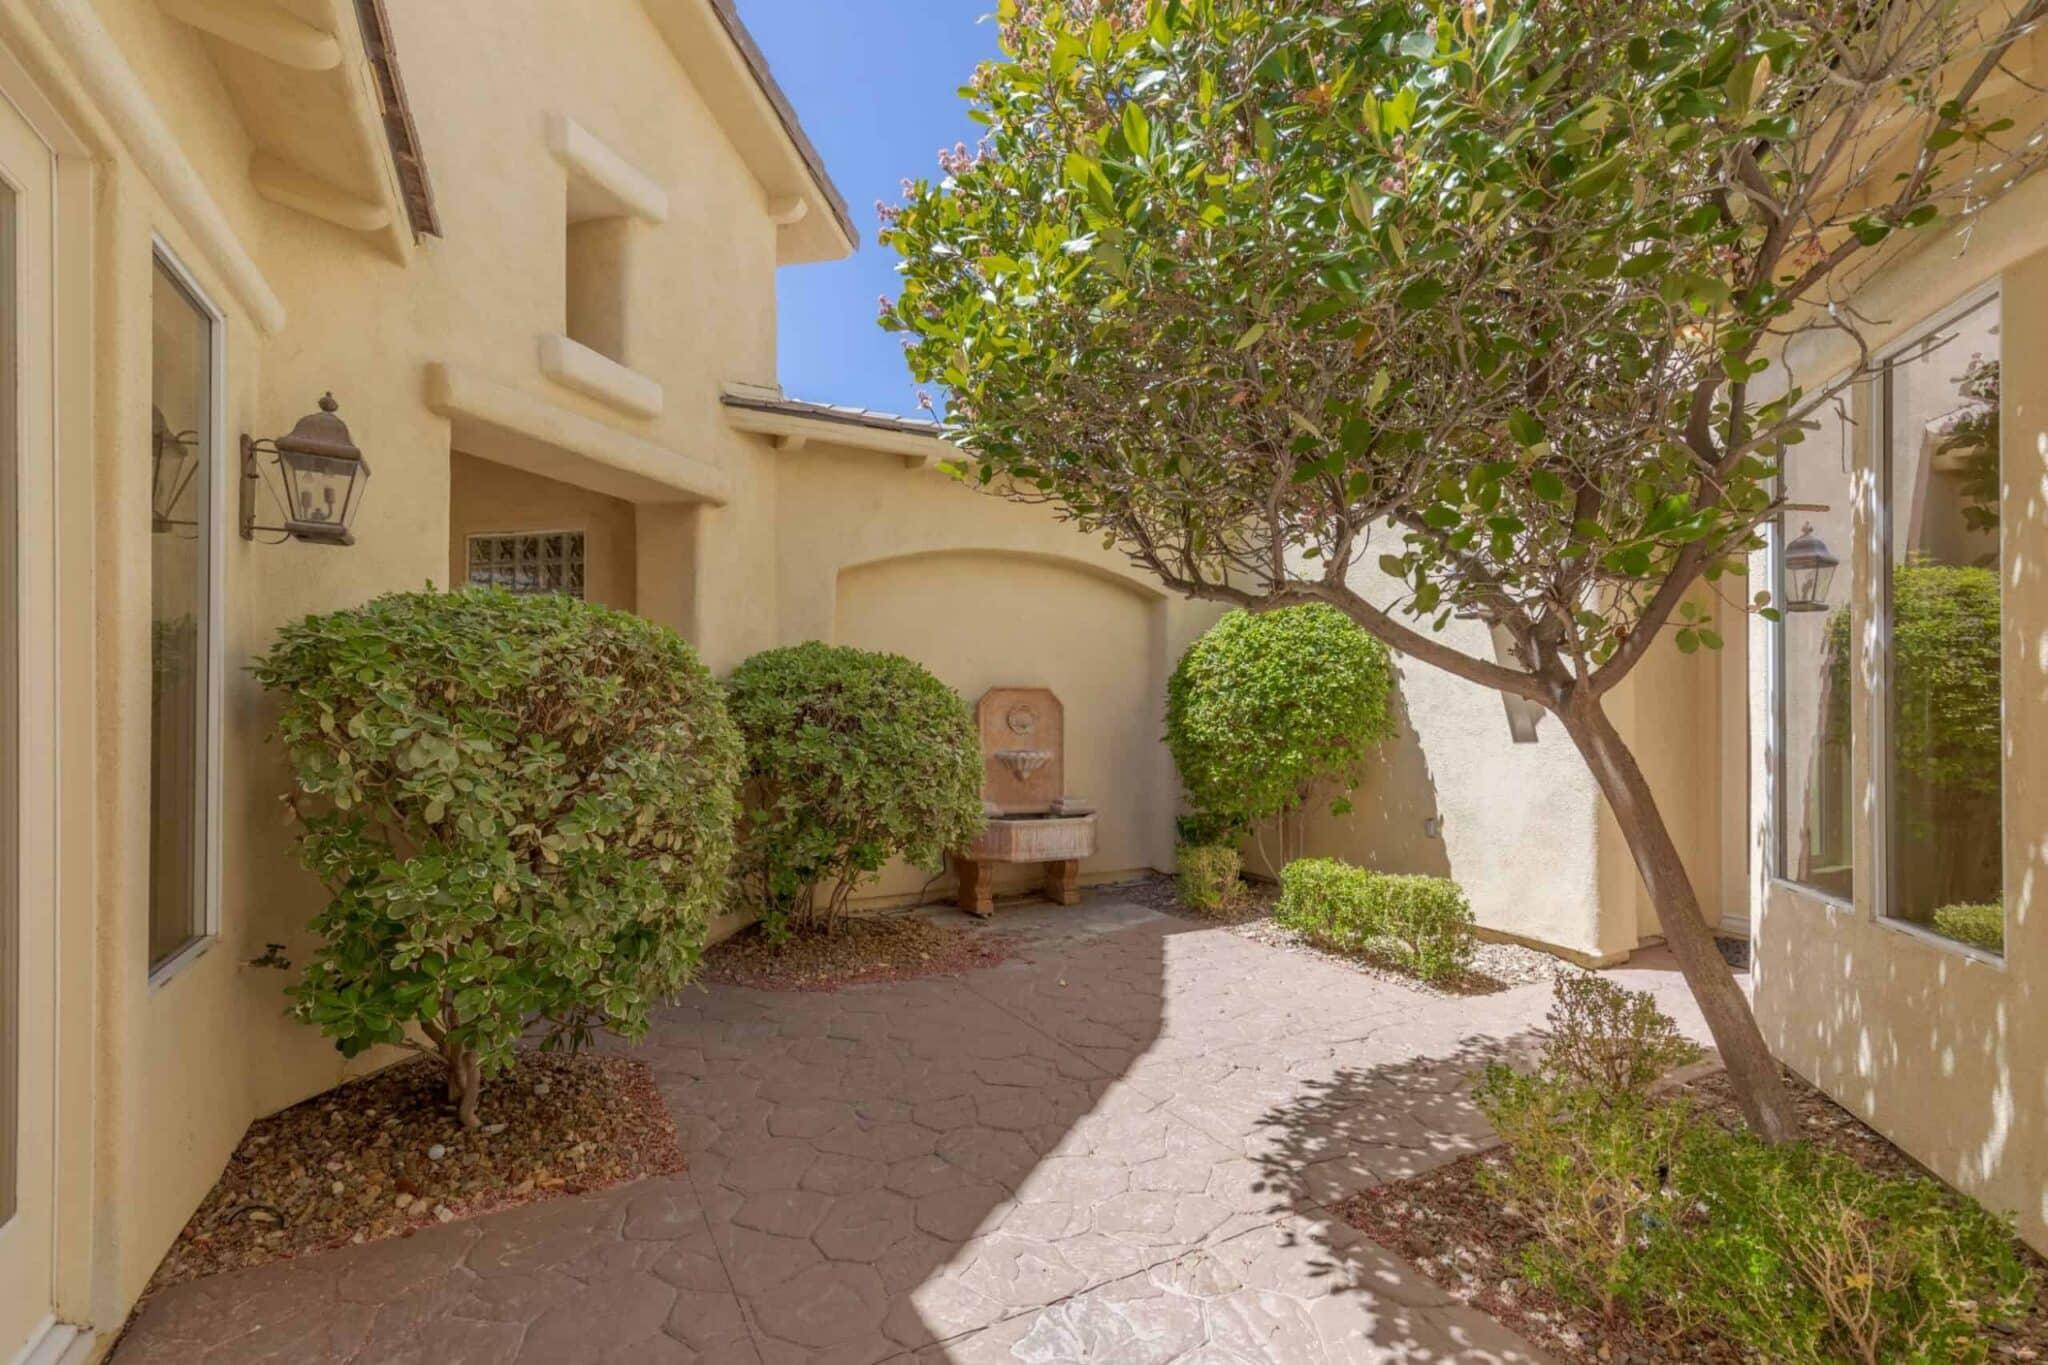 las-vegas-luxry-real-estate-realtor-rob-jensen-company-2620-grassy-spring-place-rrcc05